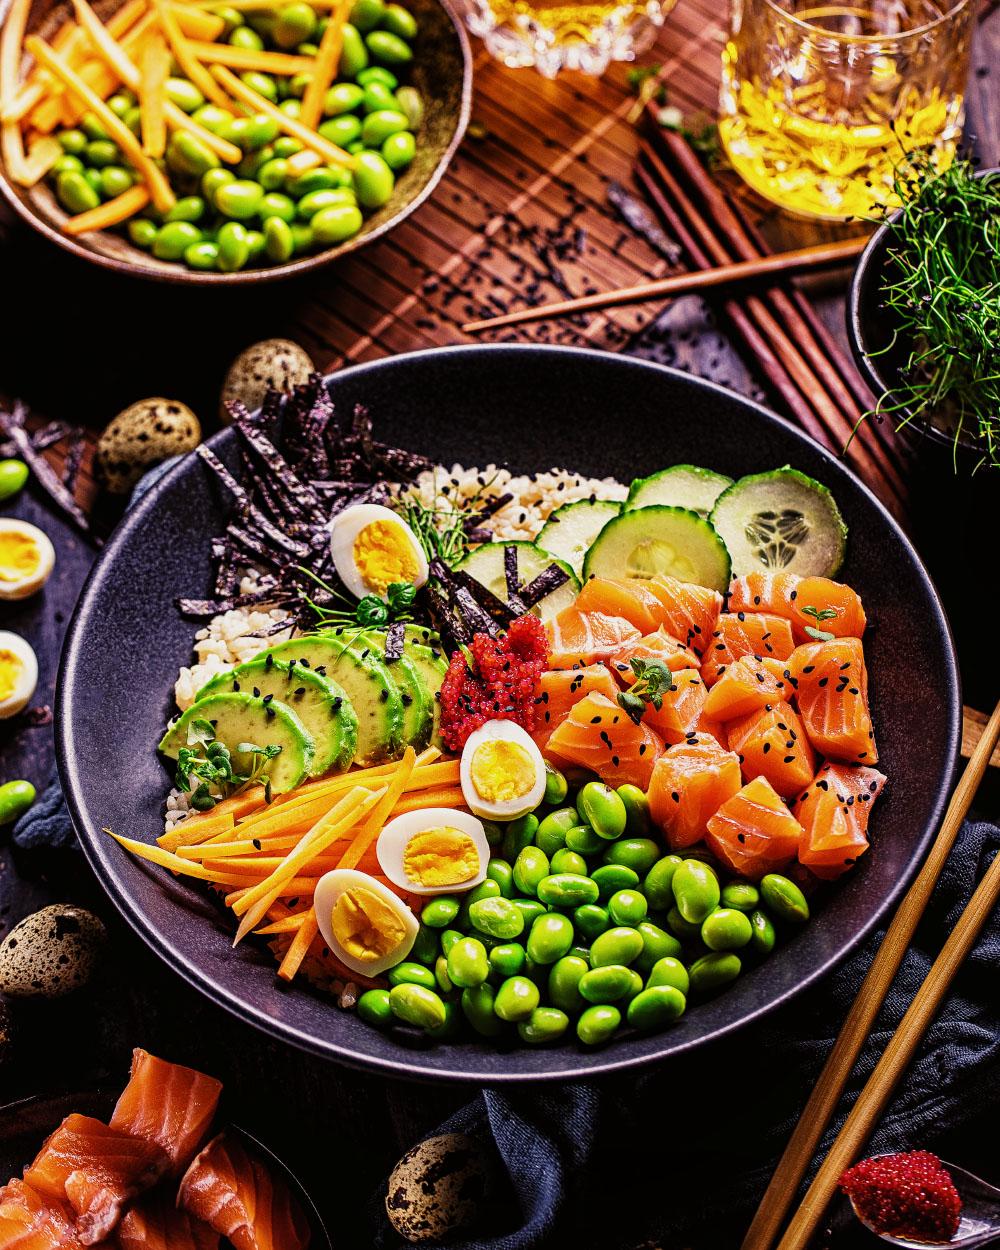 Reishunger Sushi Bowl Box Aktion Rabattcode 2 fuer 1 Heike herden